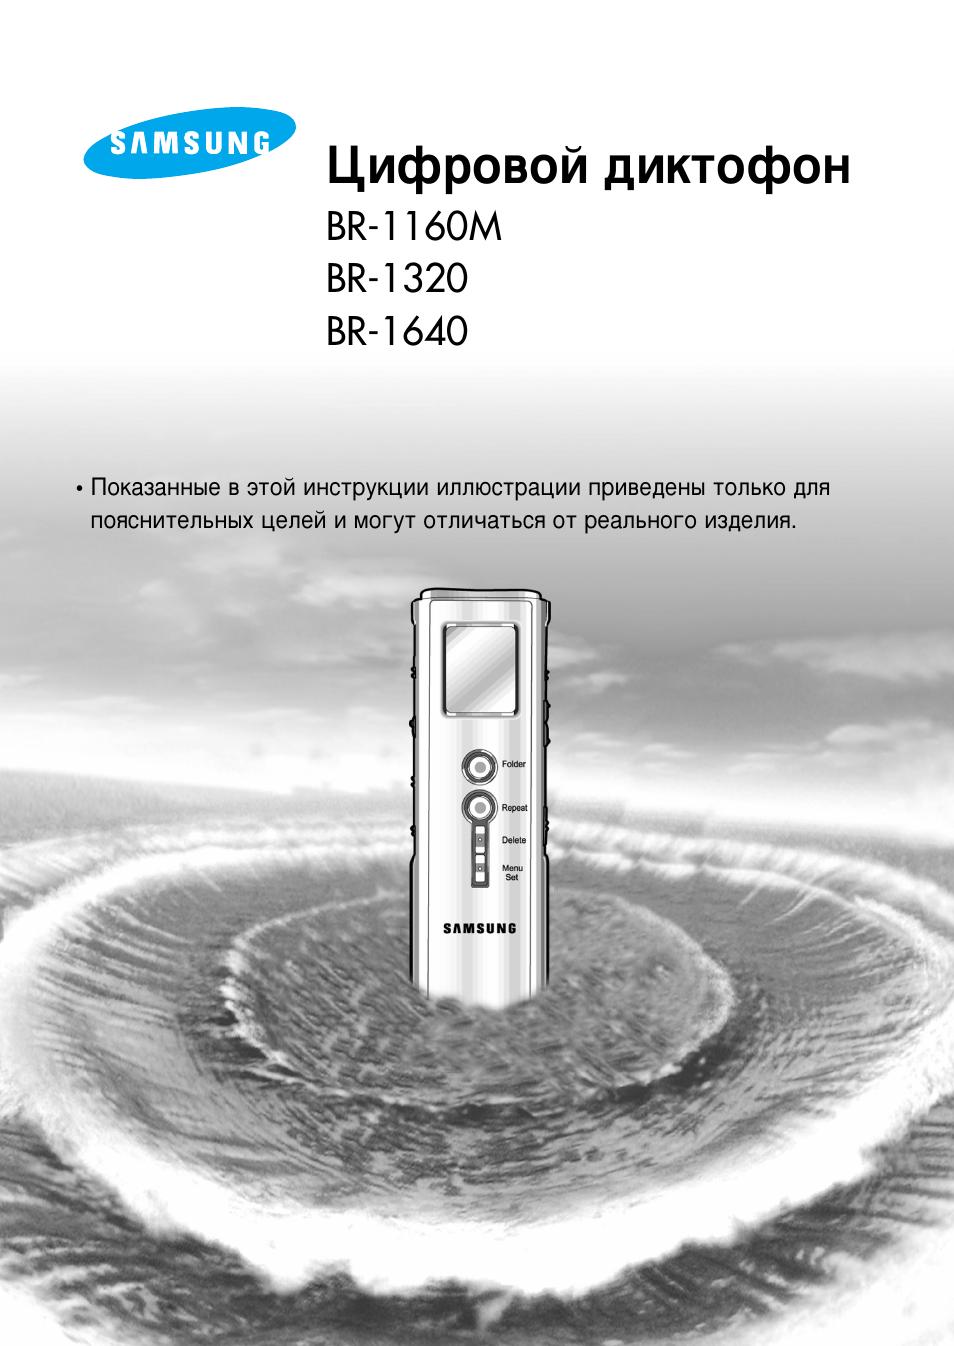 Диктофон самсунг br 1640 инструкция